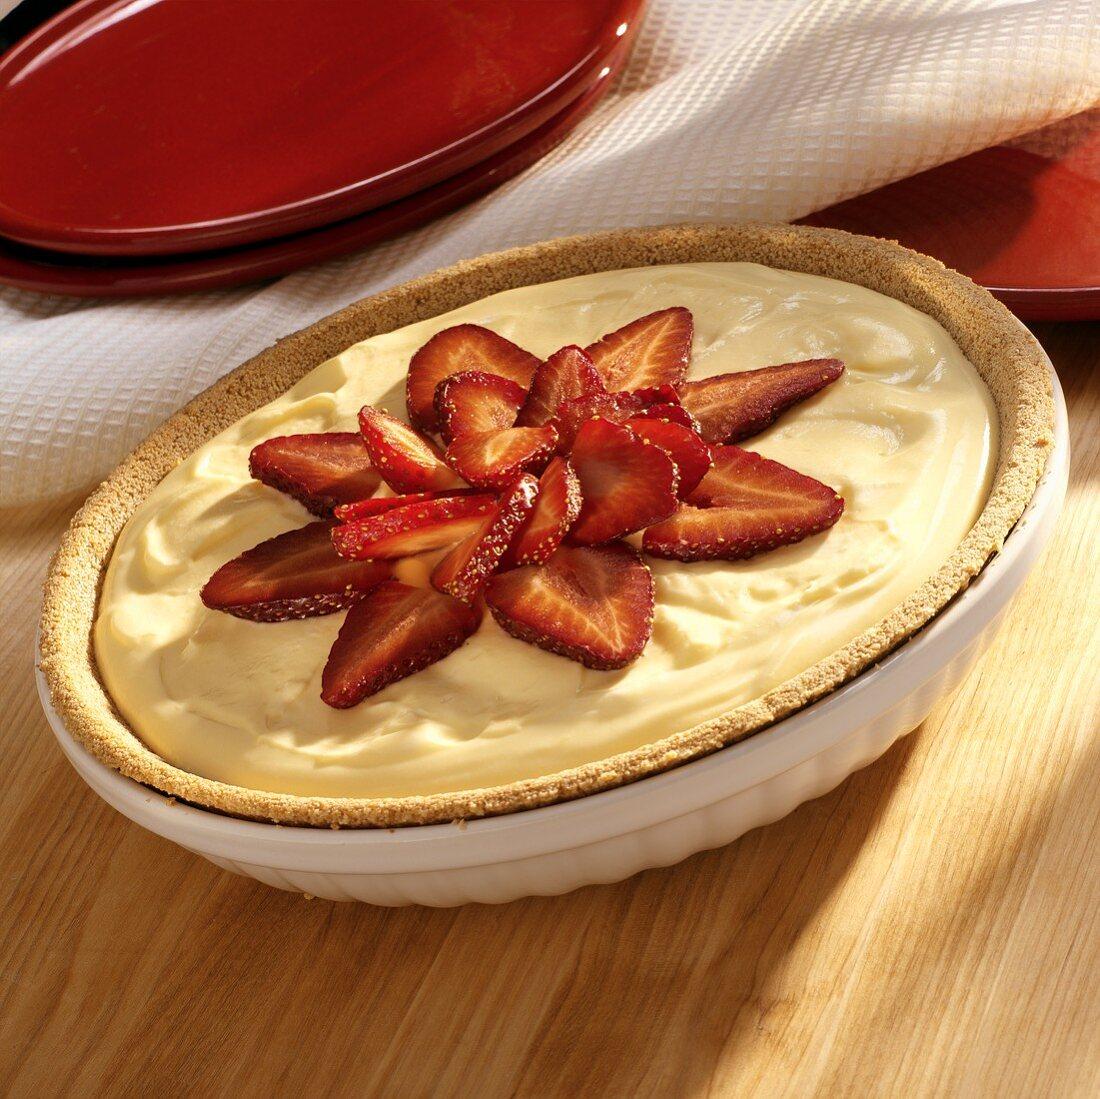 Lemon blancmange and strawberry tart